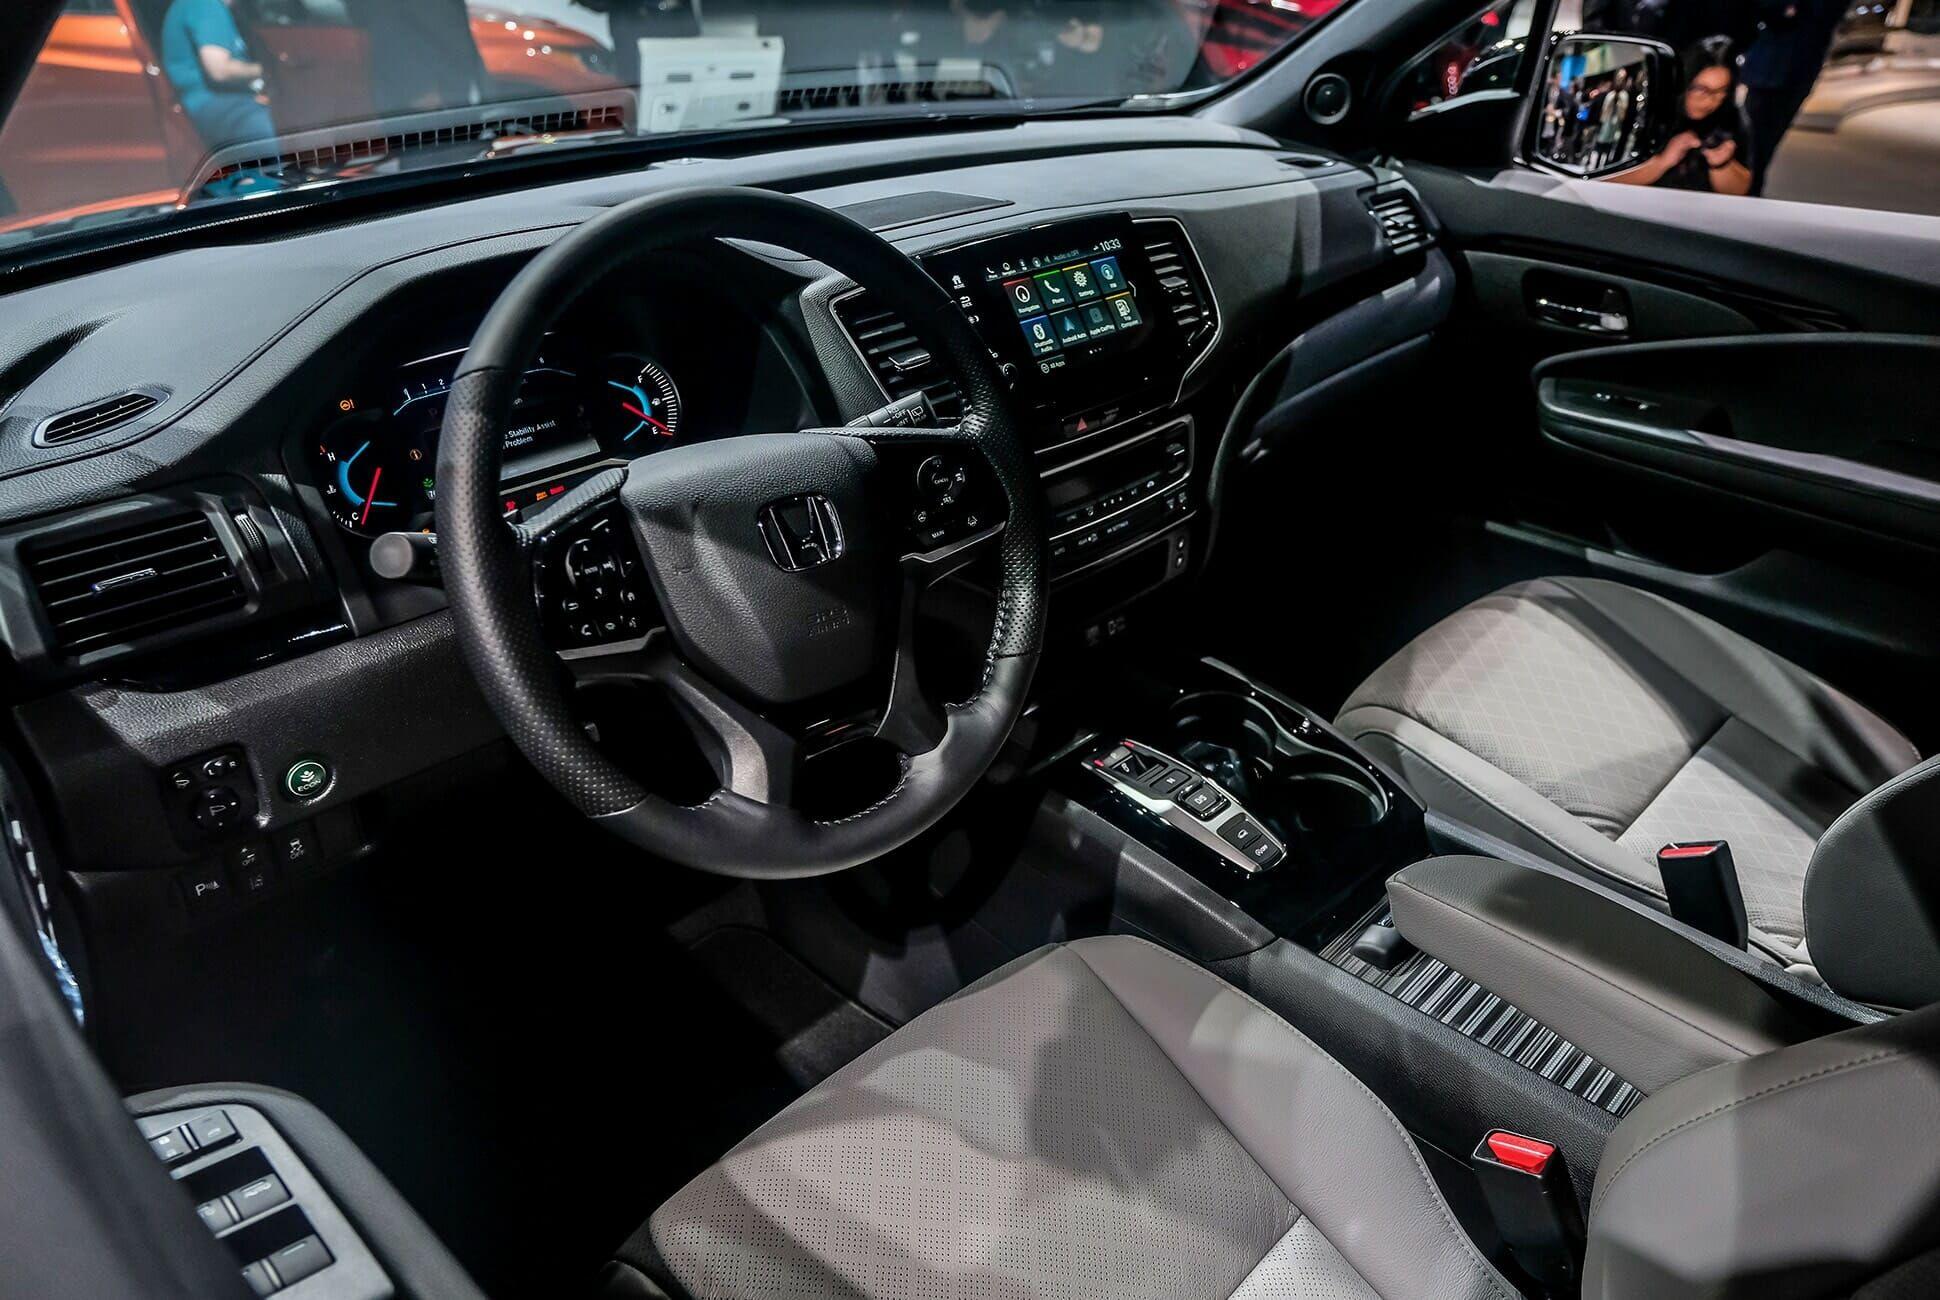 Top-10-LA-Auto-Show-Cars-gear-patrol-Honda-Passport-slide-4